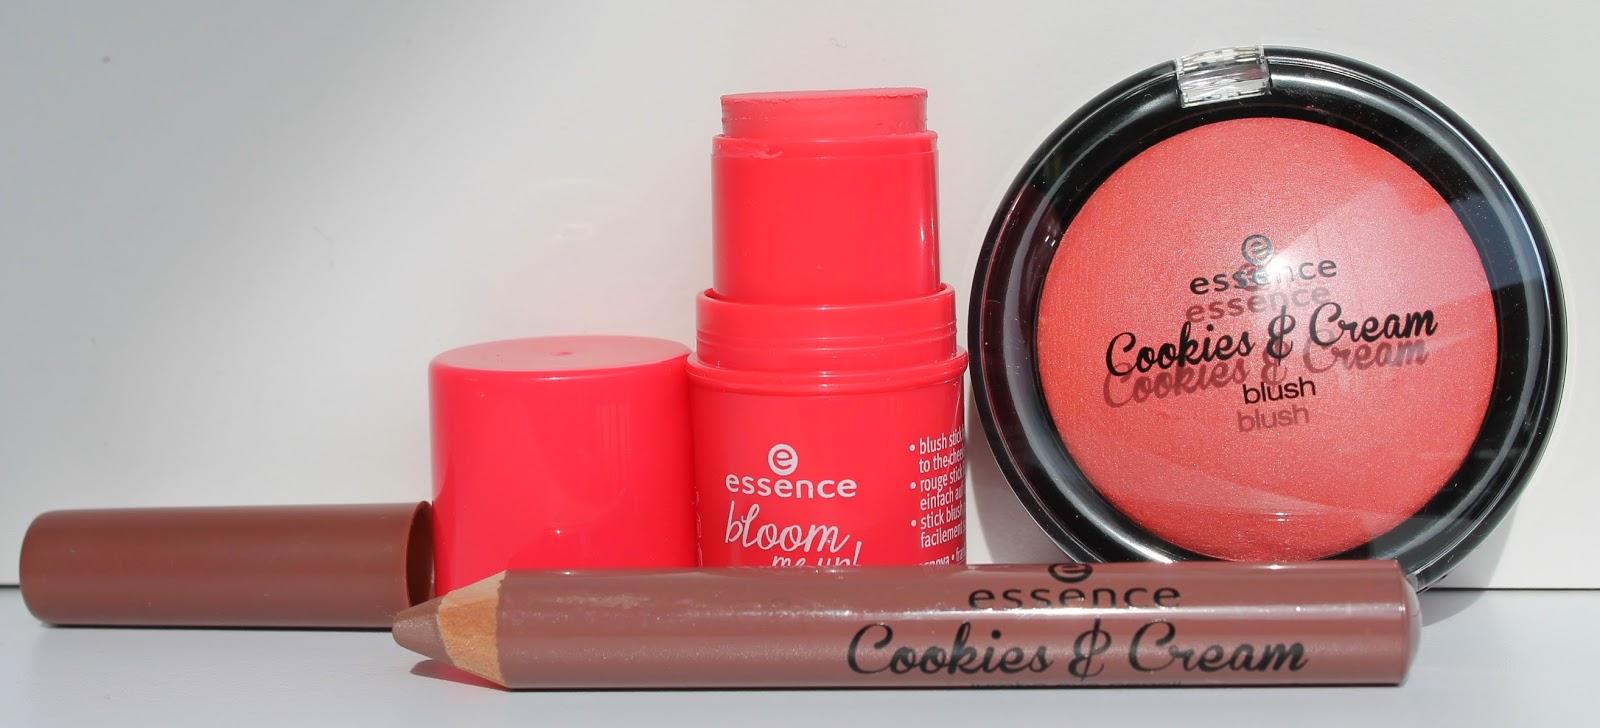 Cookies & Cream Essence